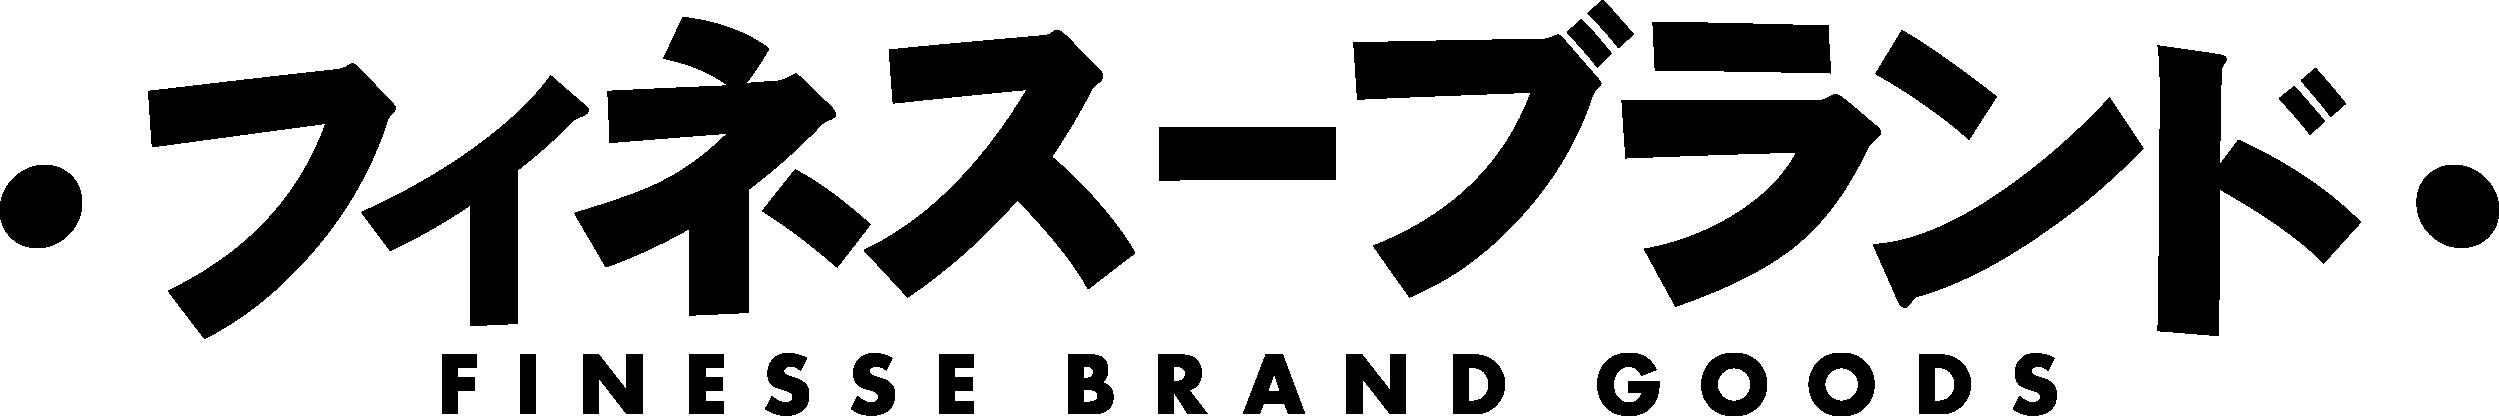 Clothing and Logo Design